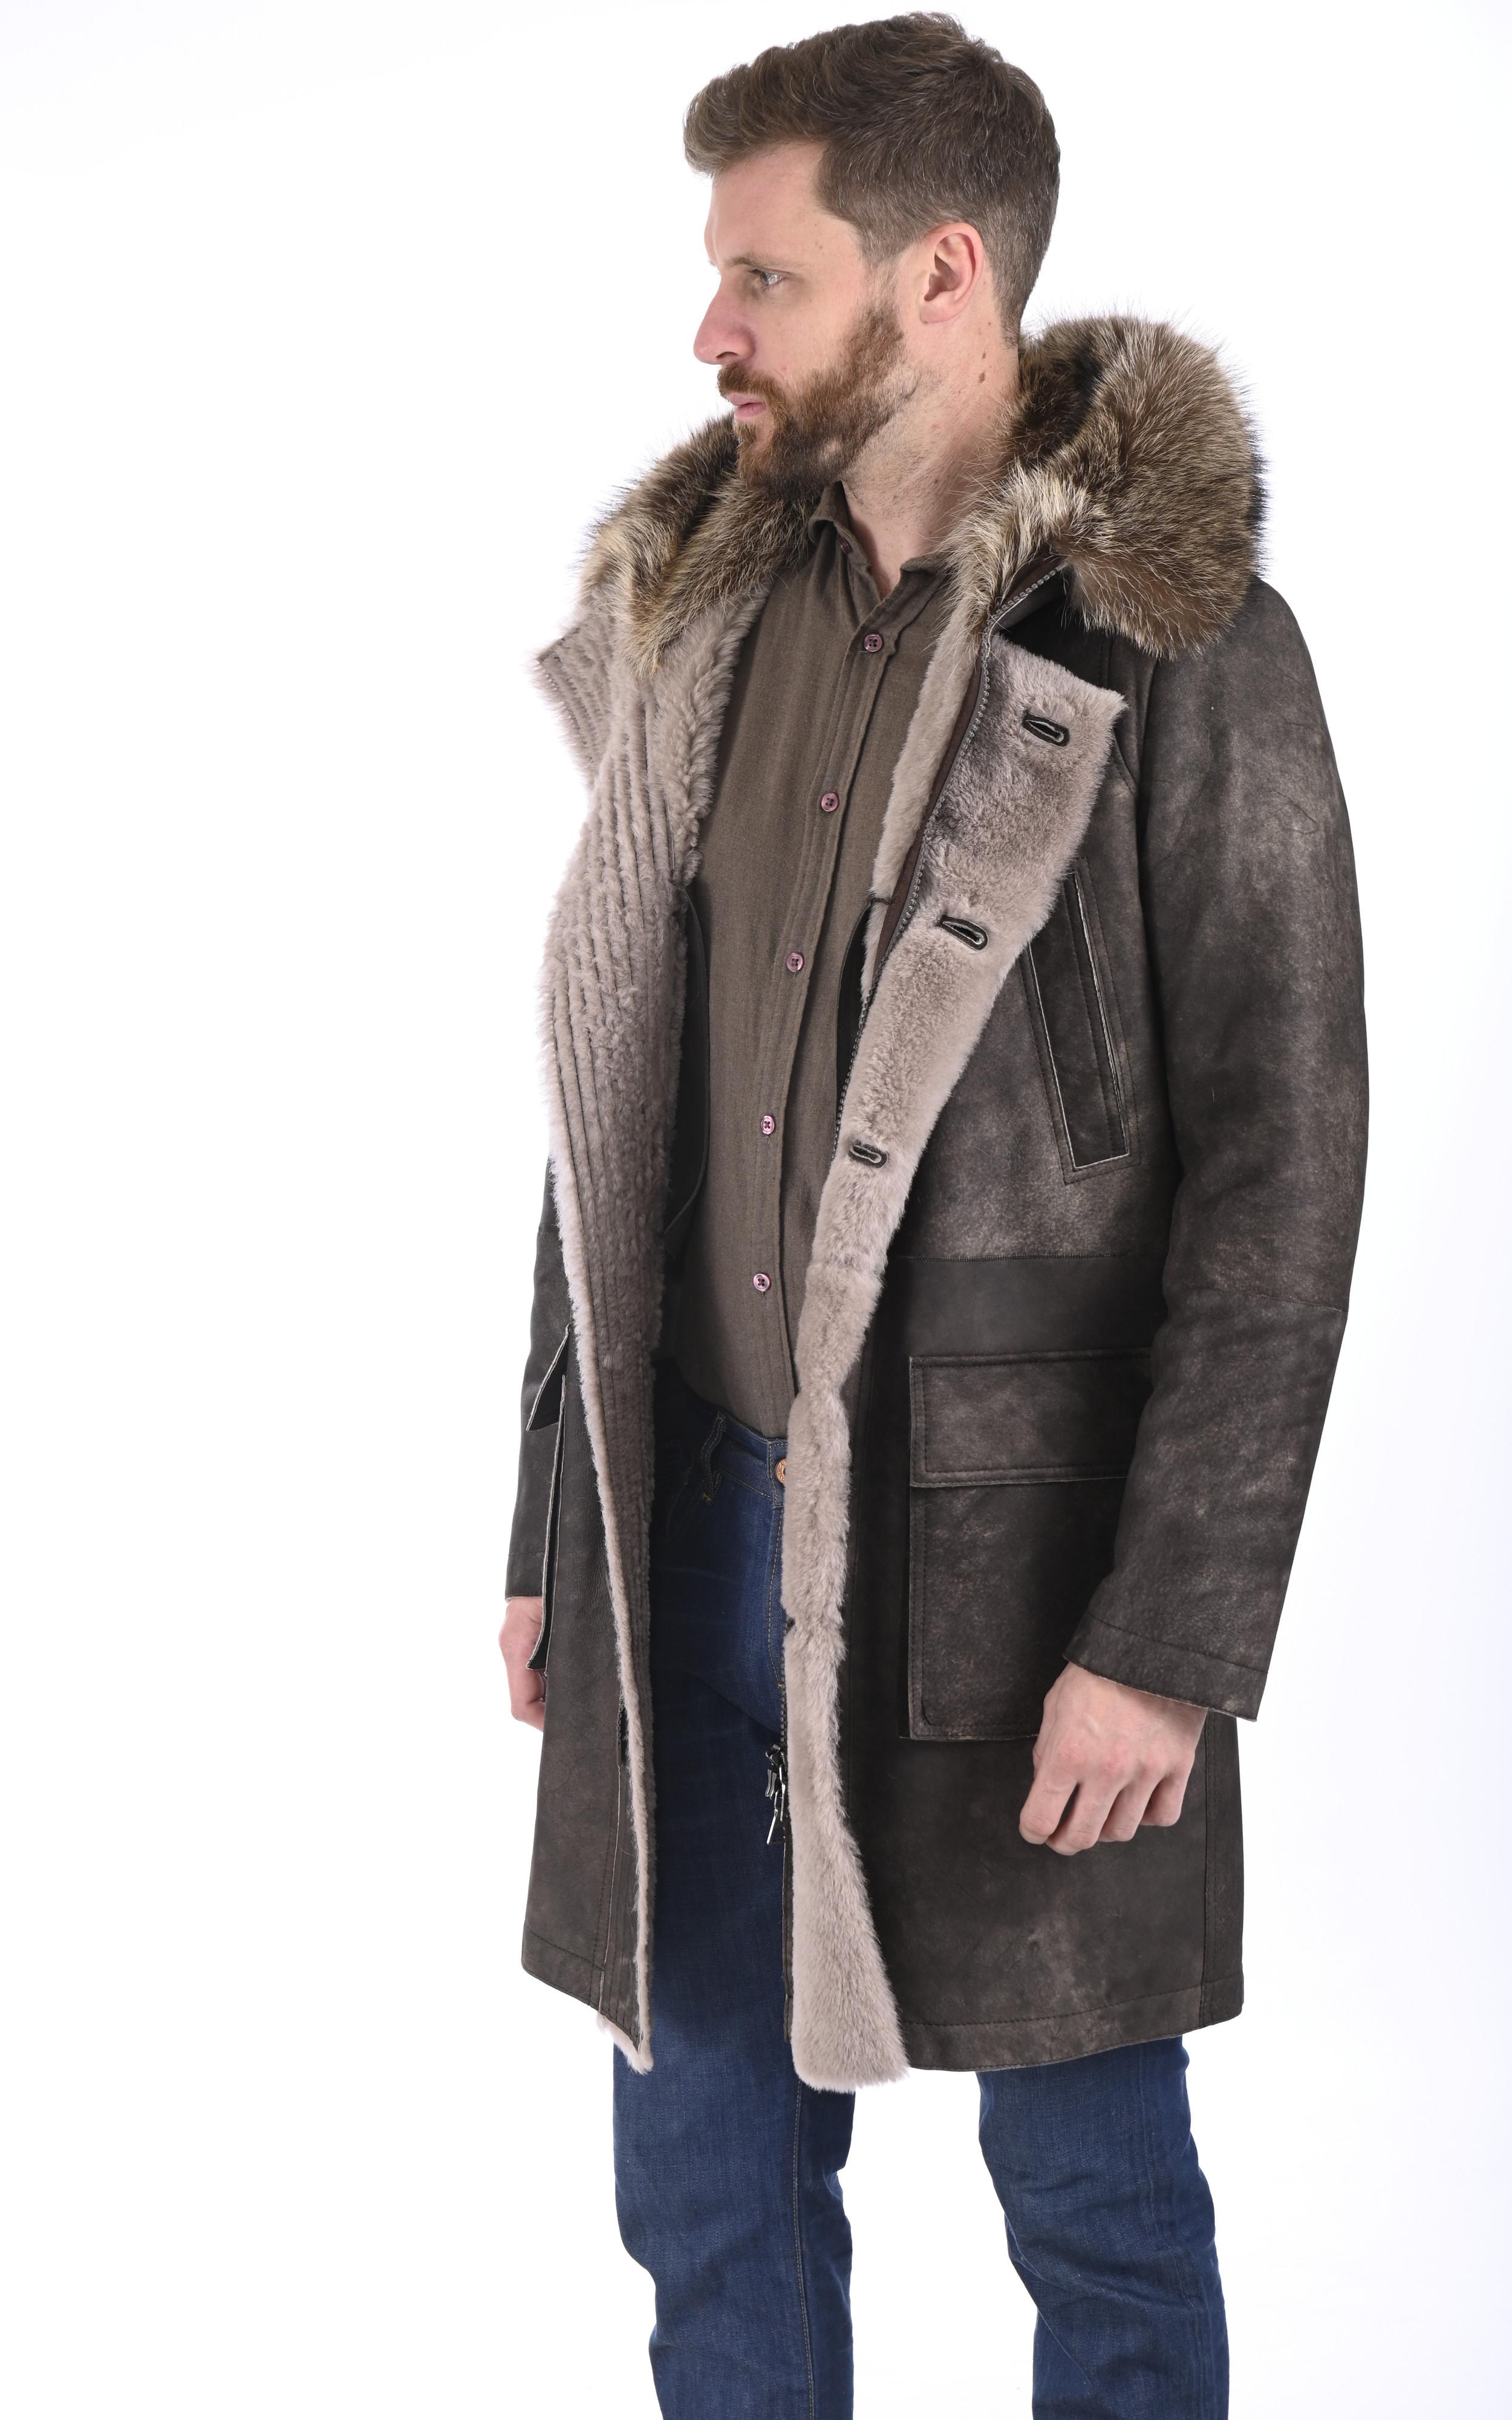 Manteau agneau et marmotte taupe Artico